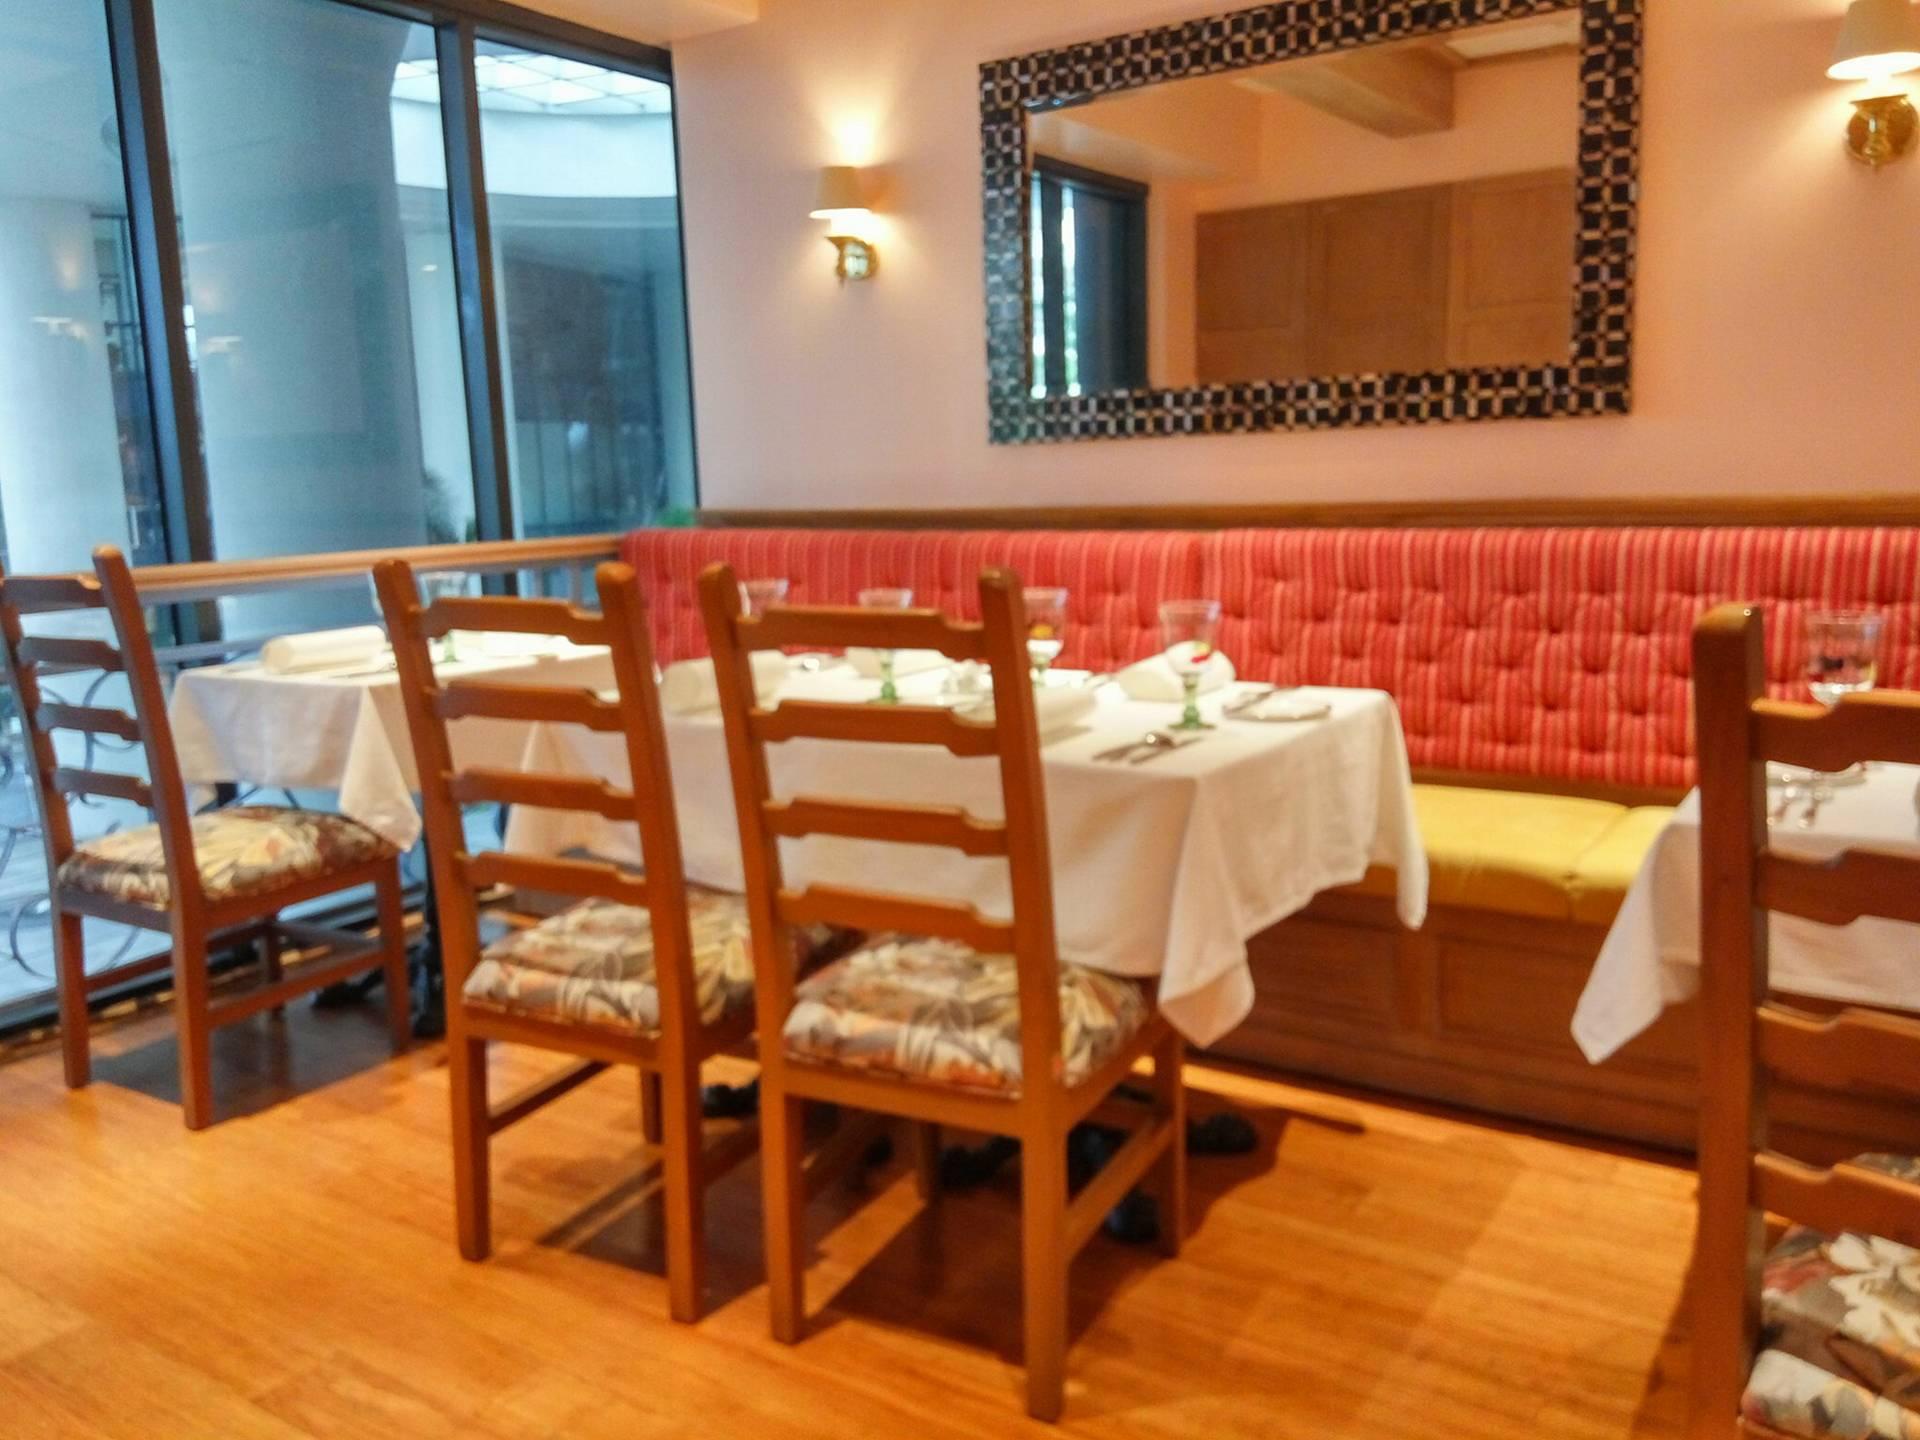 Lemuria Restaurant and Wine Bar, The Plaza at Arya Residences, McKinley Parkway, Bonifacio Global City, Taguig - 2